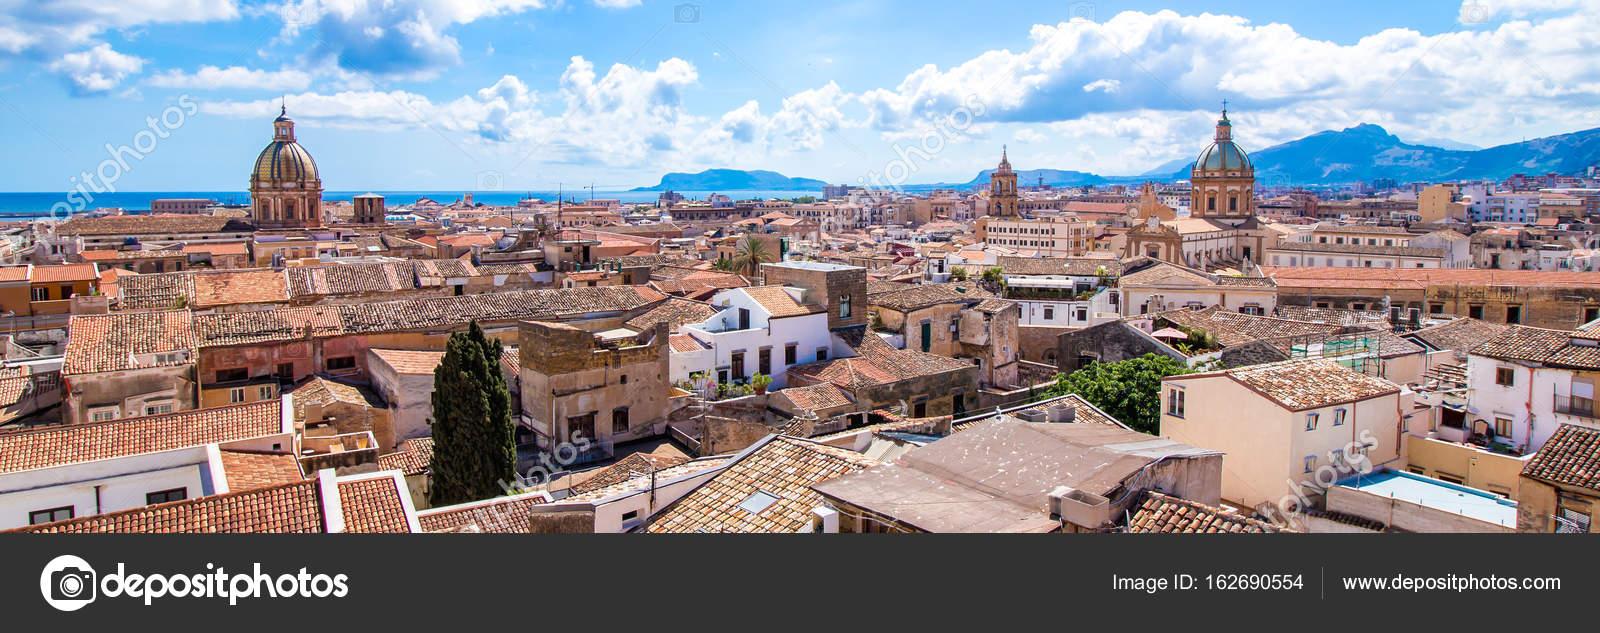 Fotos da cidade de palermo na italia 90